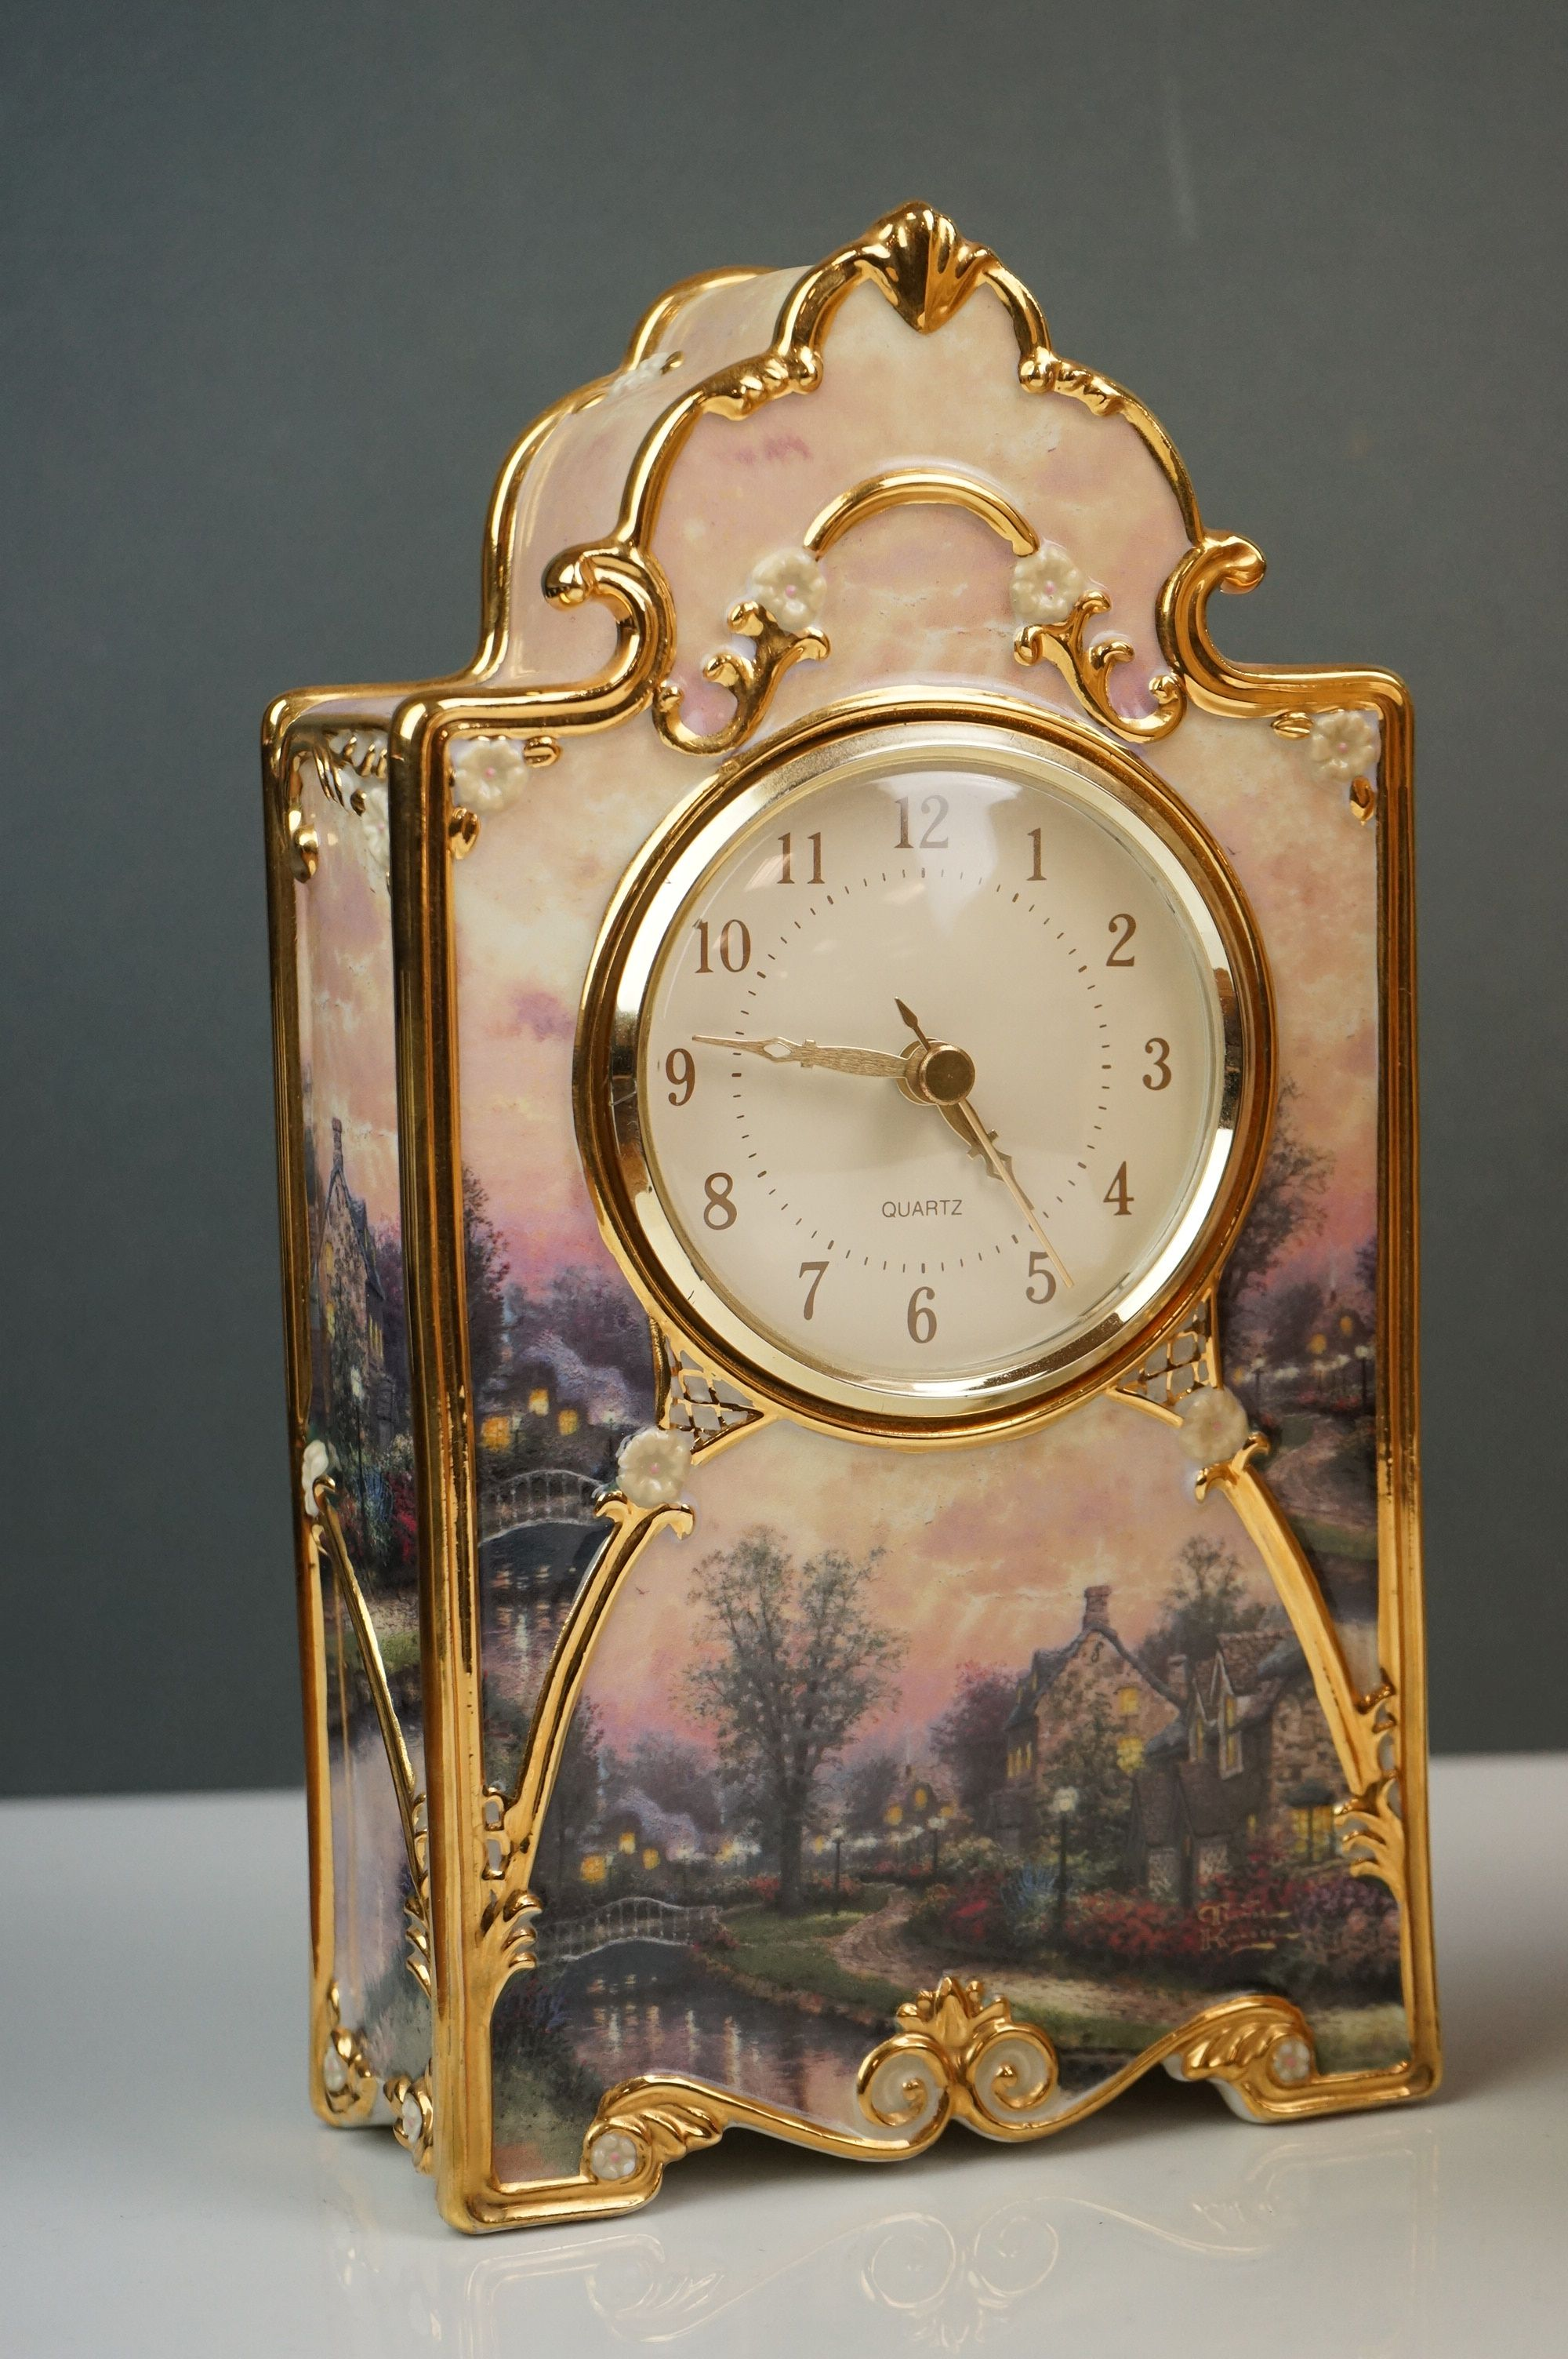 Bradford Exchange Lamplight Lane Heirloom porcelain clock by Thomas Kinkade, issue no. A9321, - Image 2 of 9